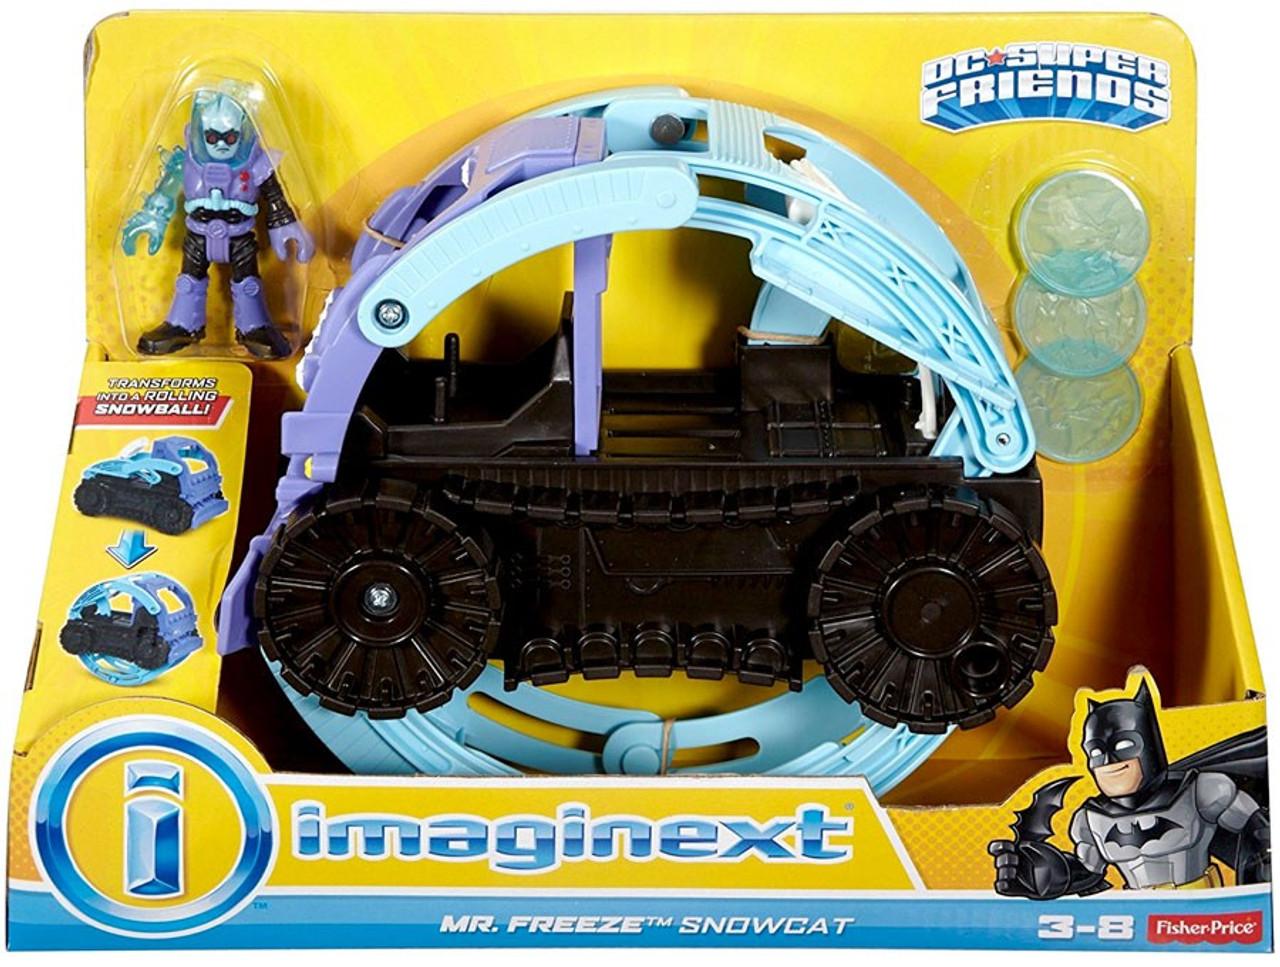 Fisher Price DC Super Friends Imaginext Mr. Freeze Snowcat 3 ...